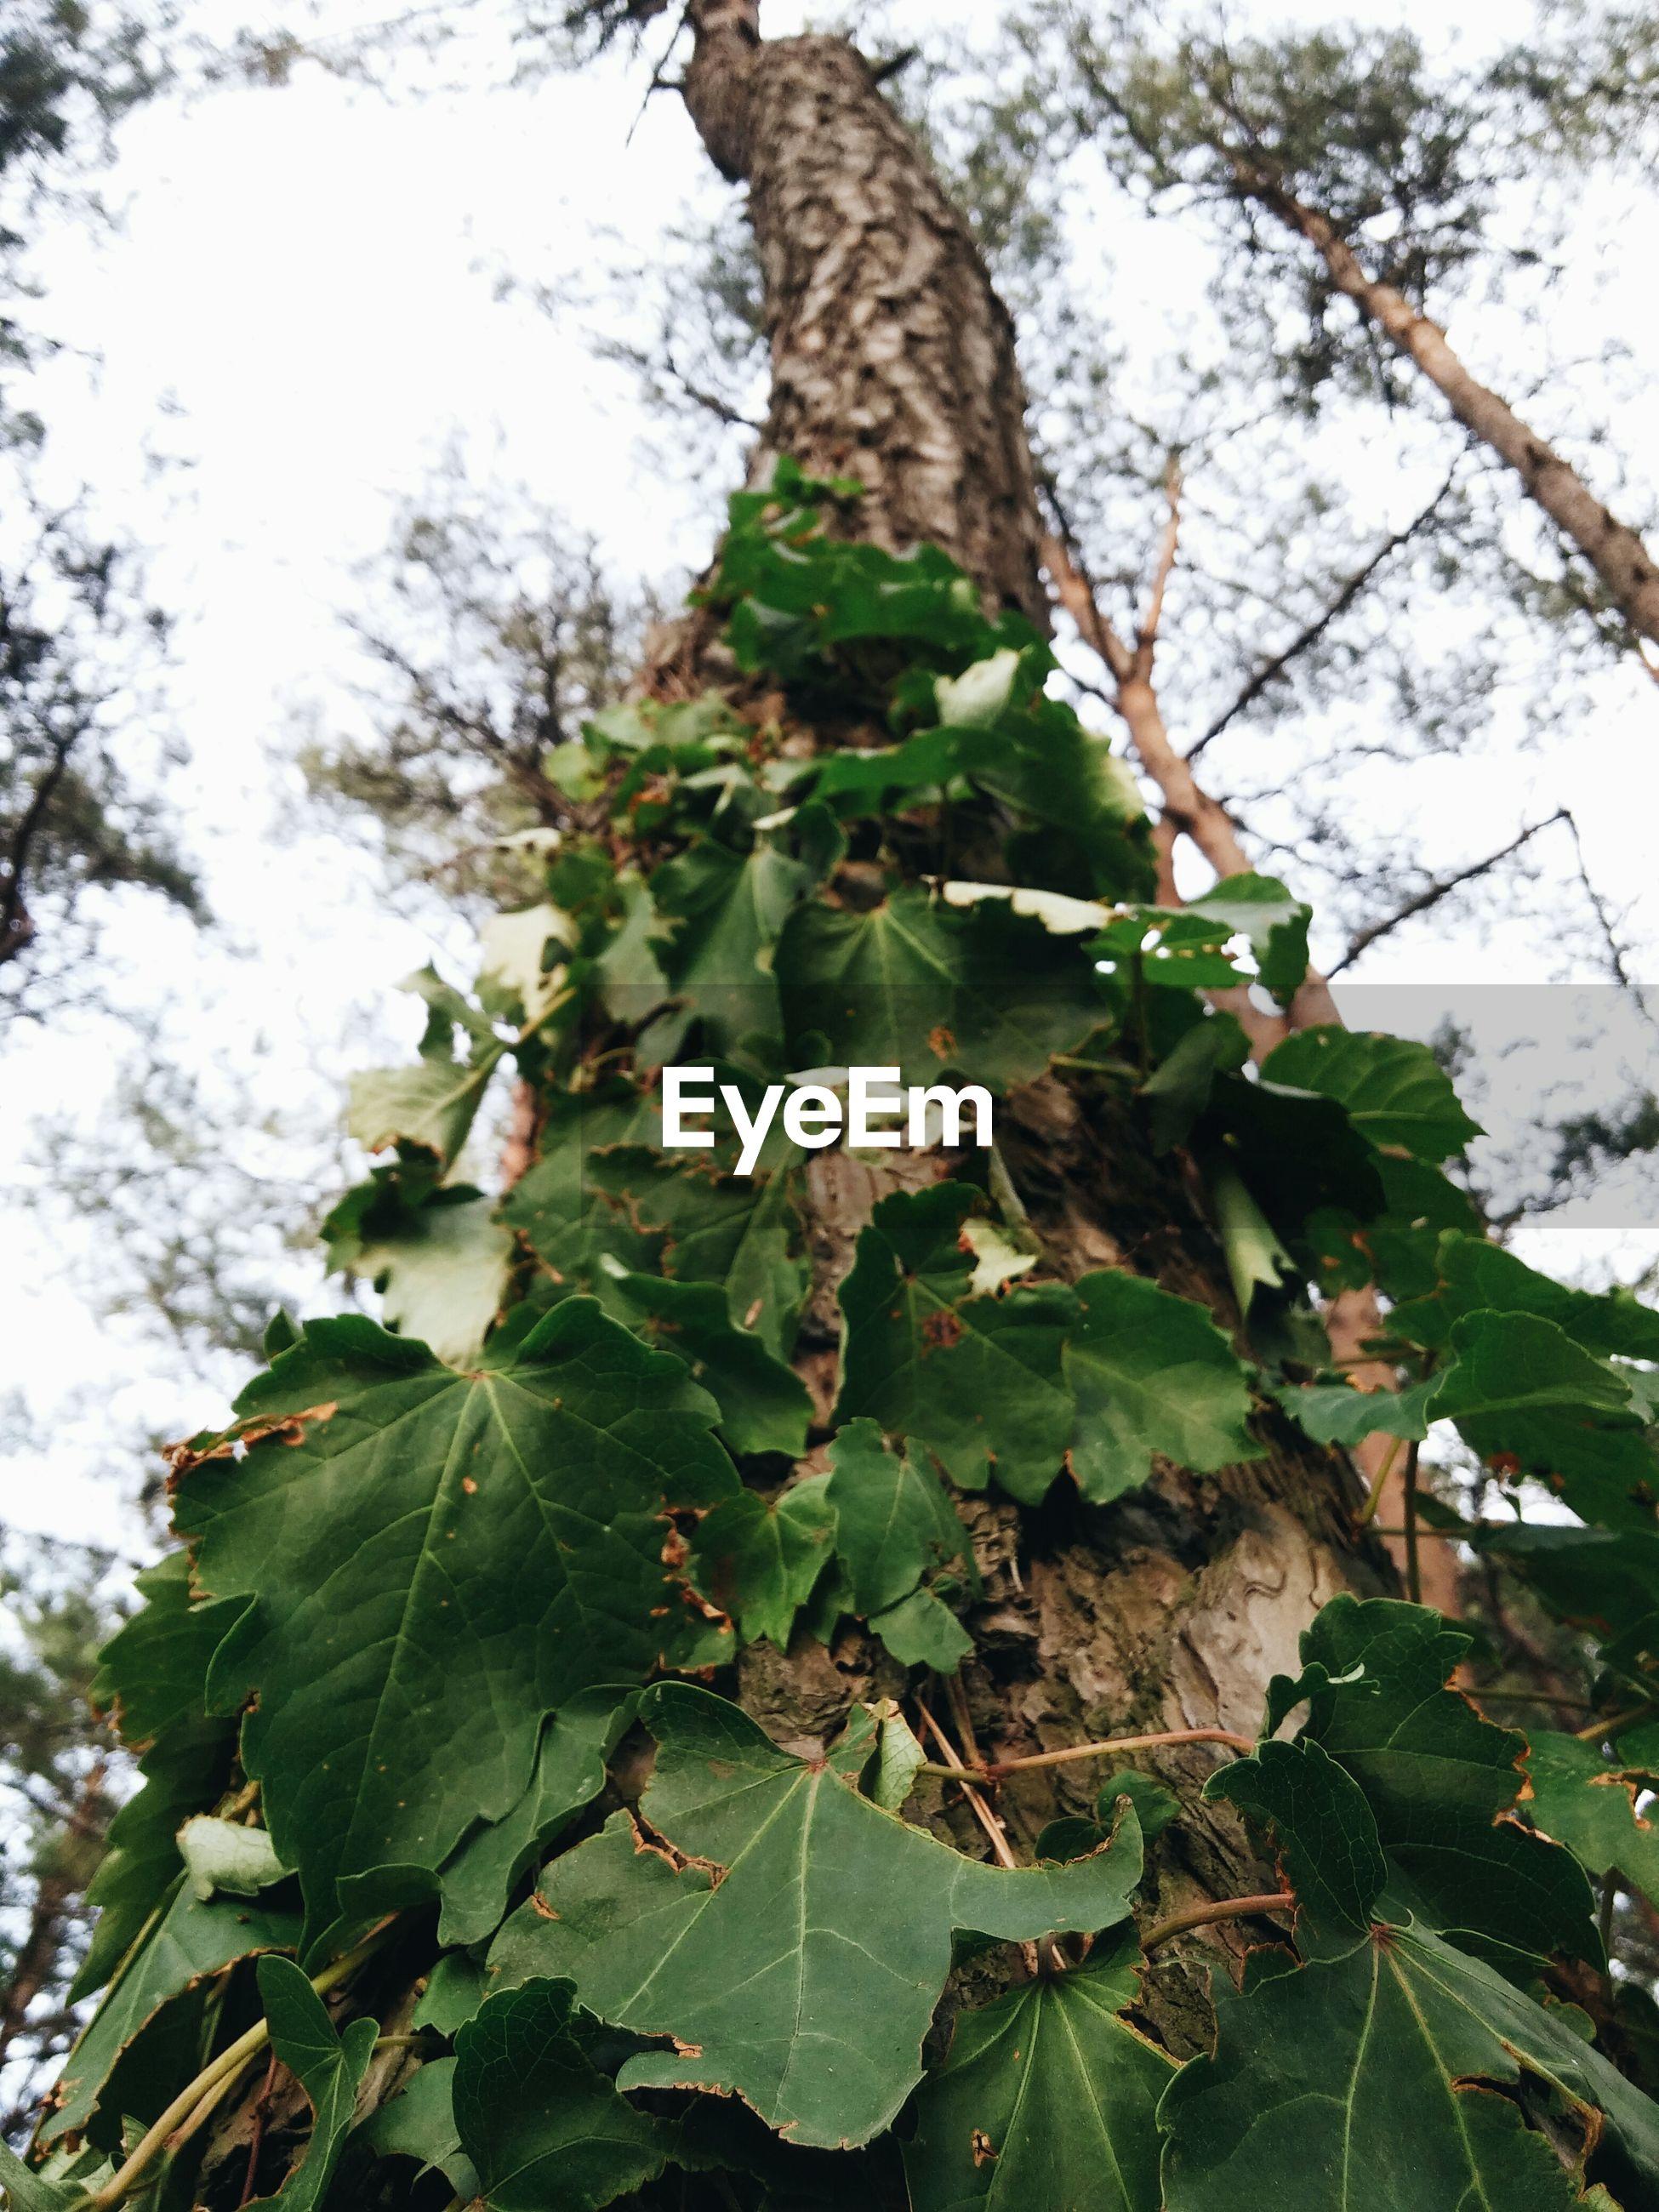 Creeper plant on tree trunk